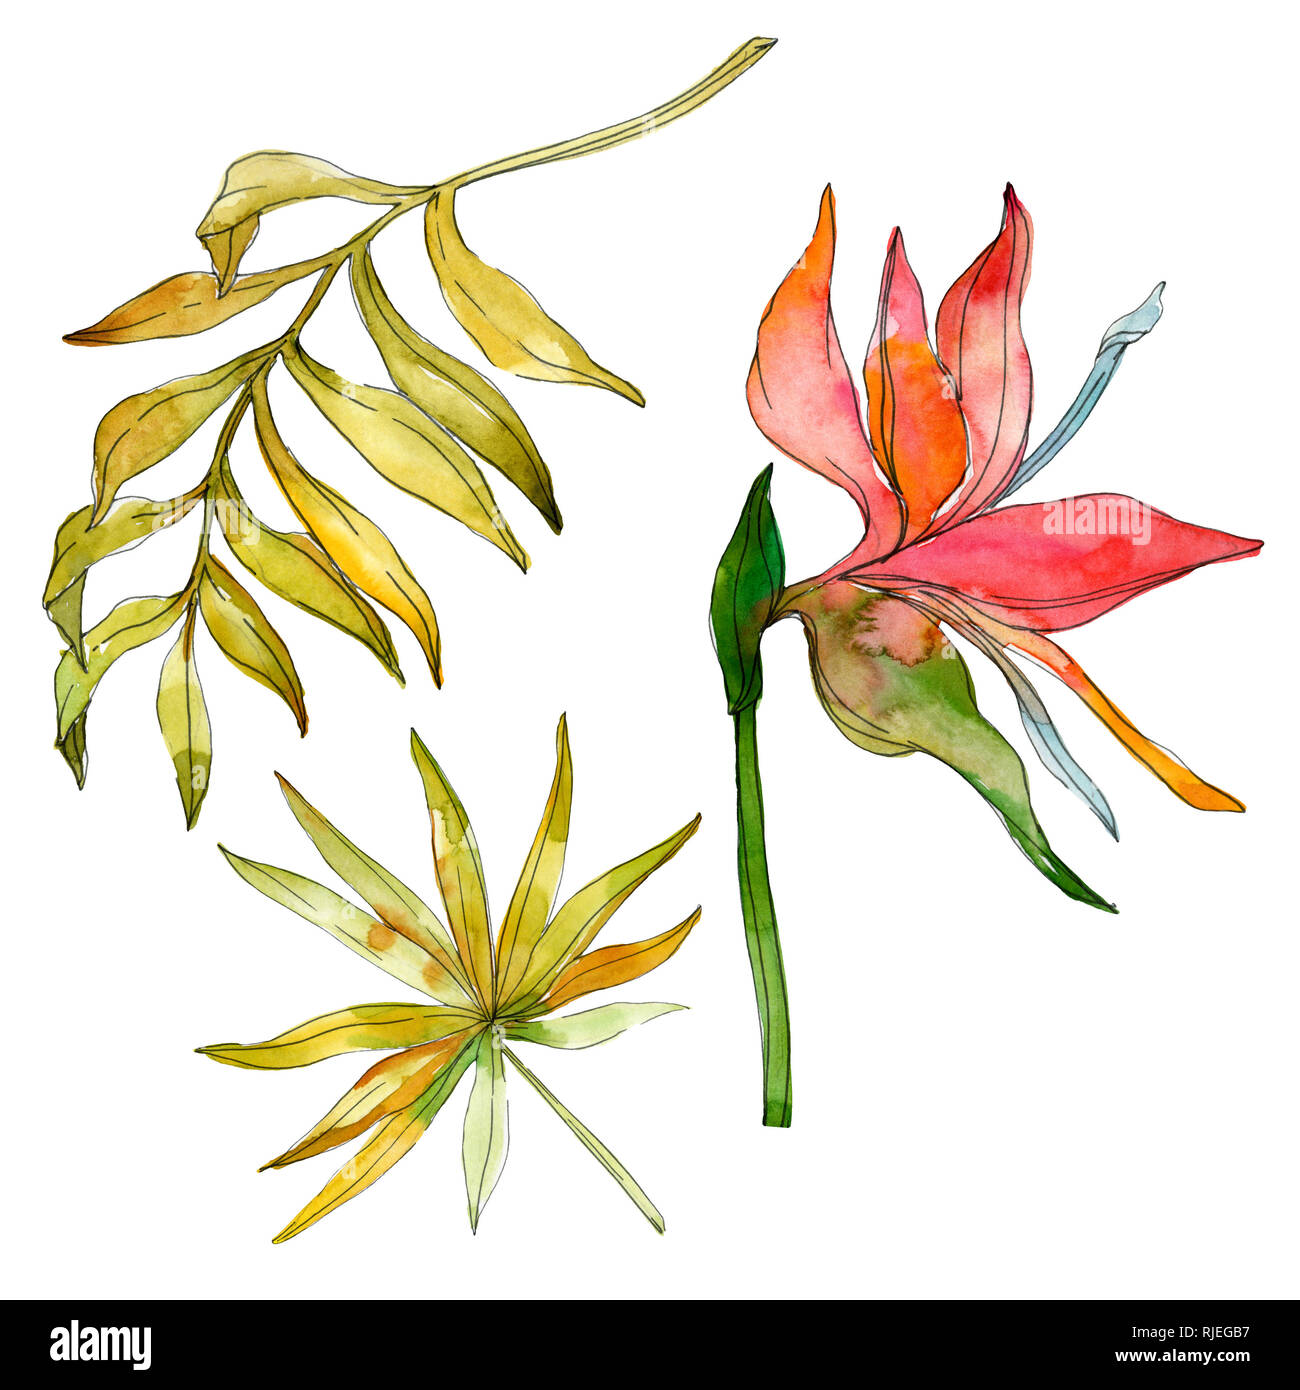 Botanico Floral Flores Tropicales Planta Exotica Leaf Aislados